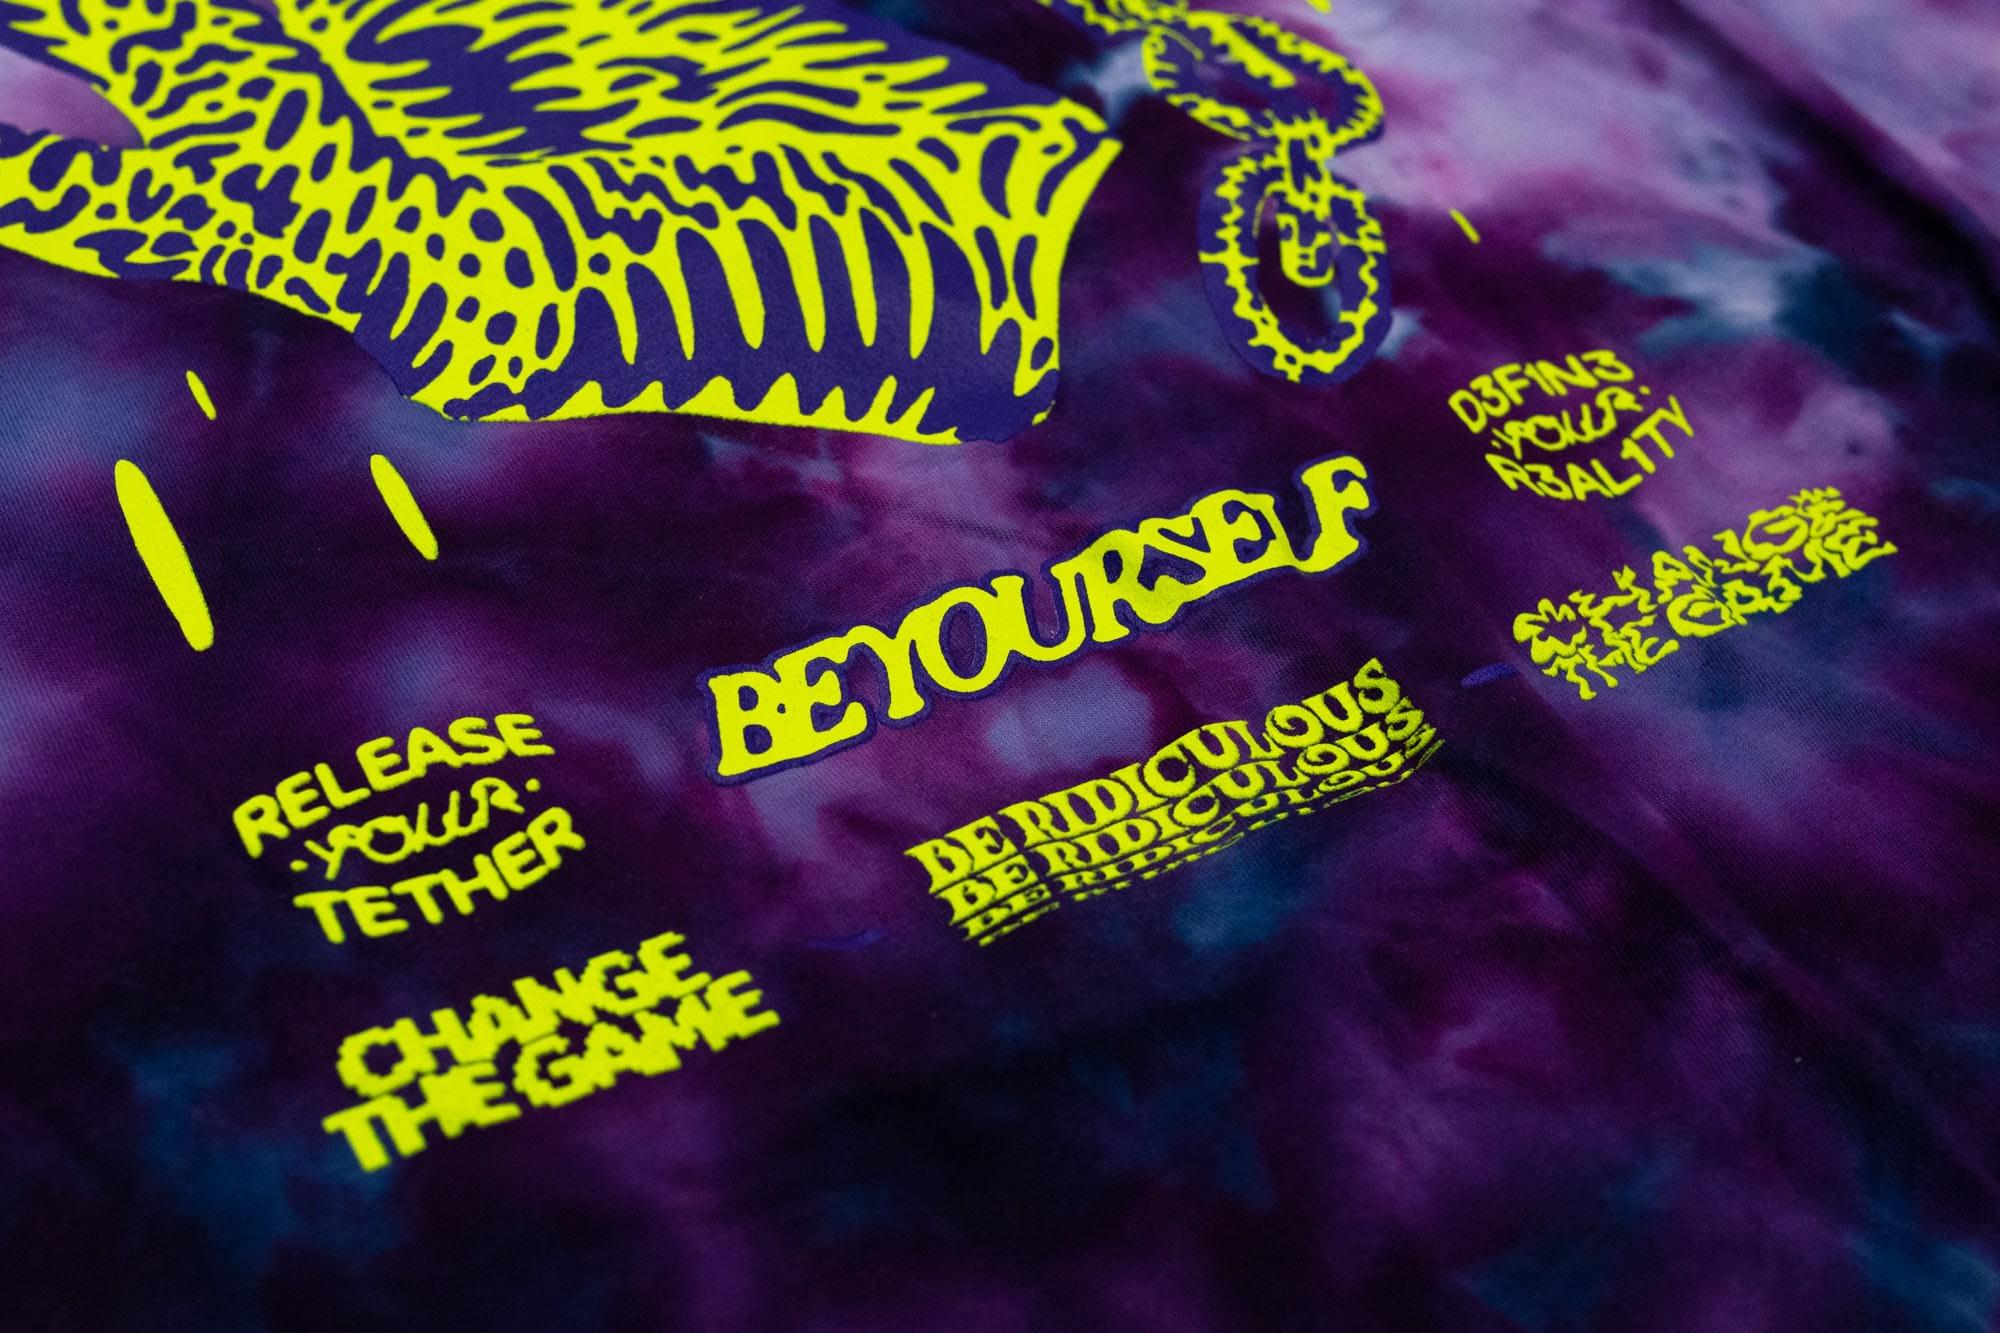 Break Free - Sleeve 5 – Change The Game